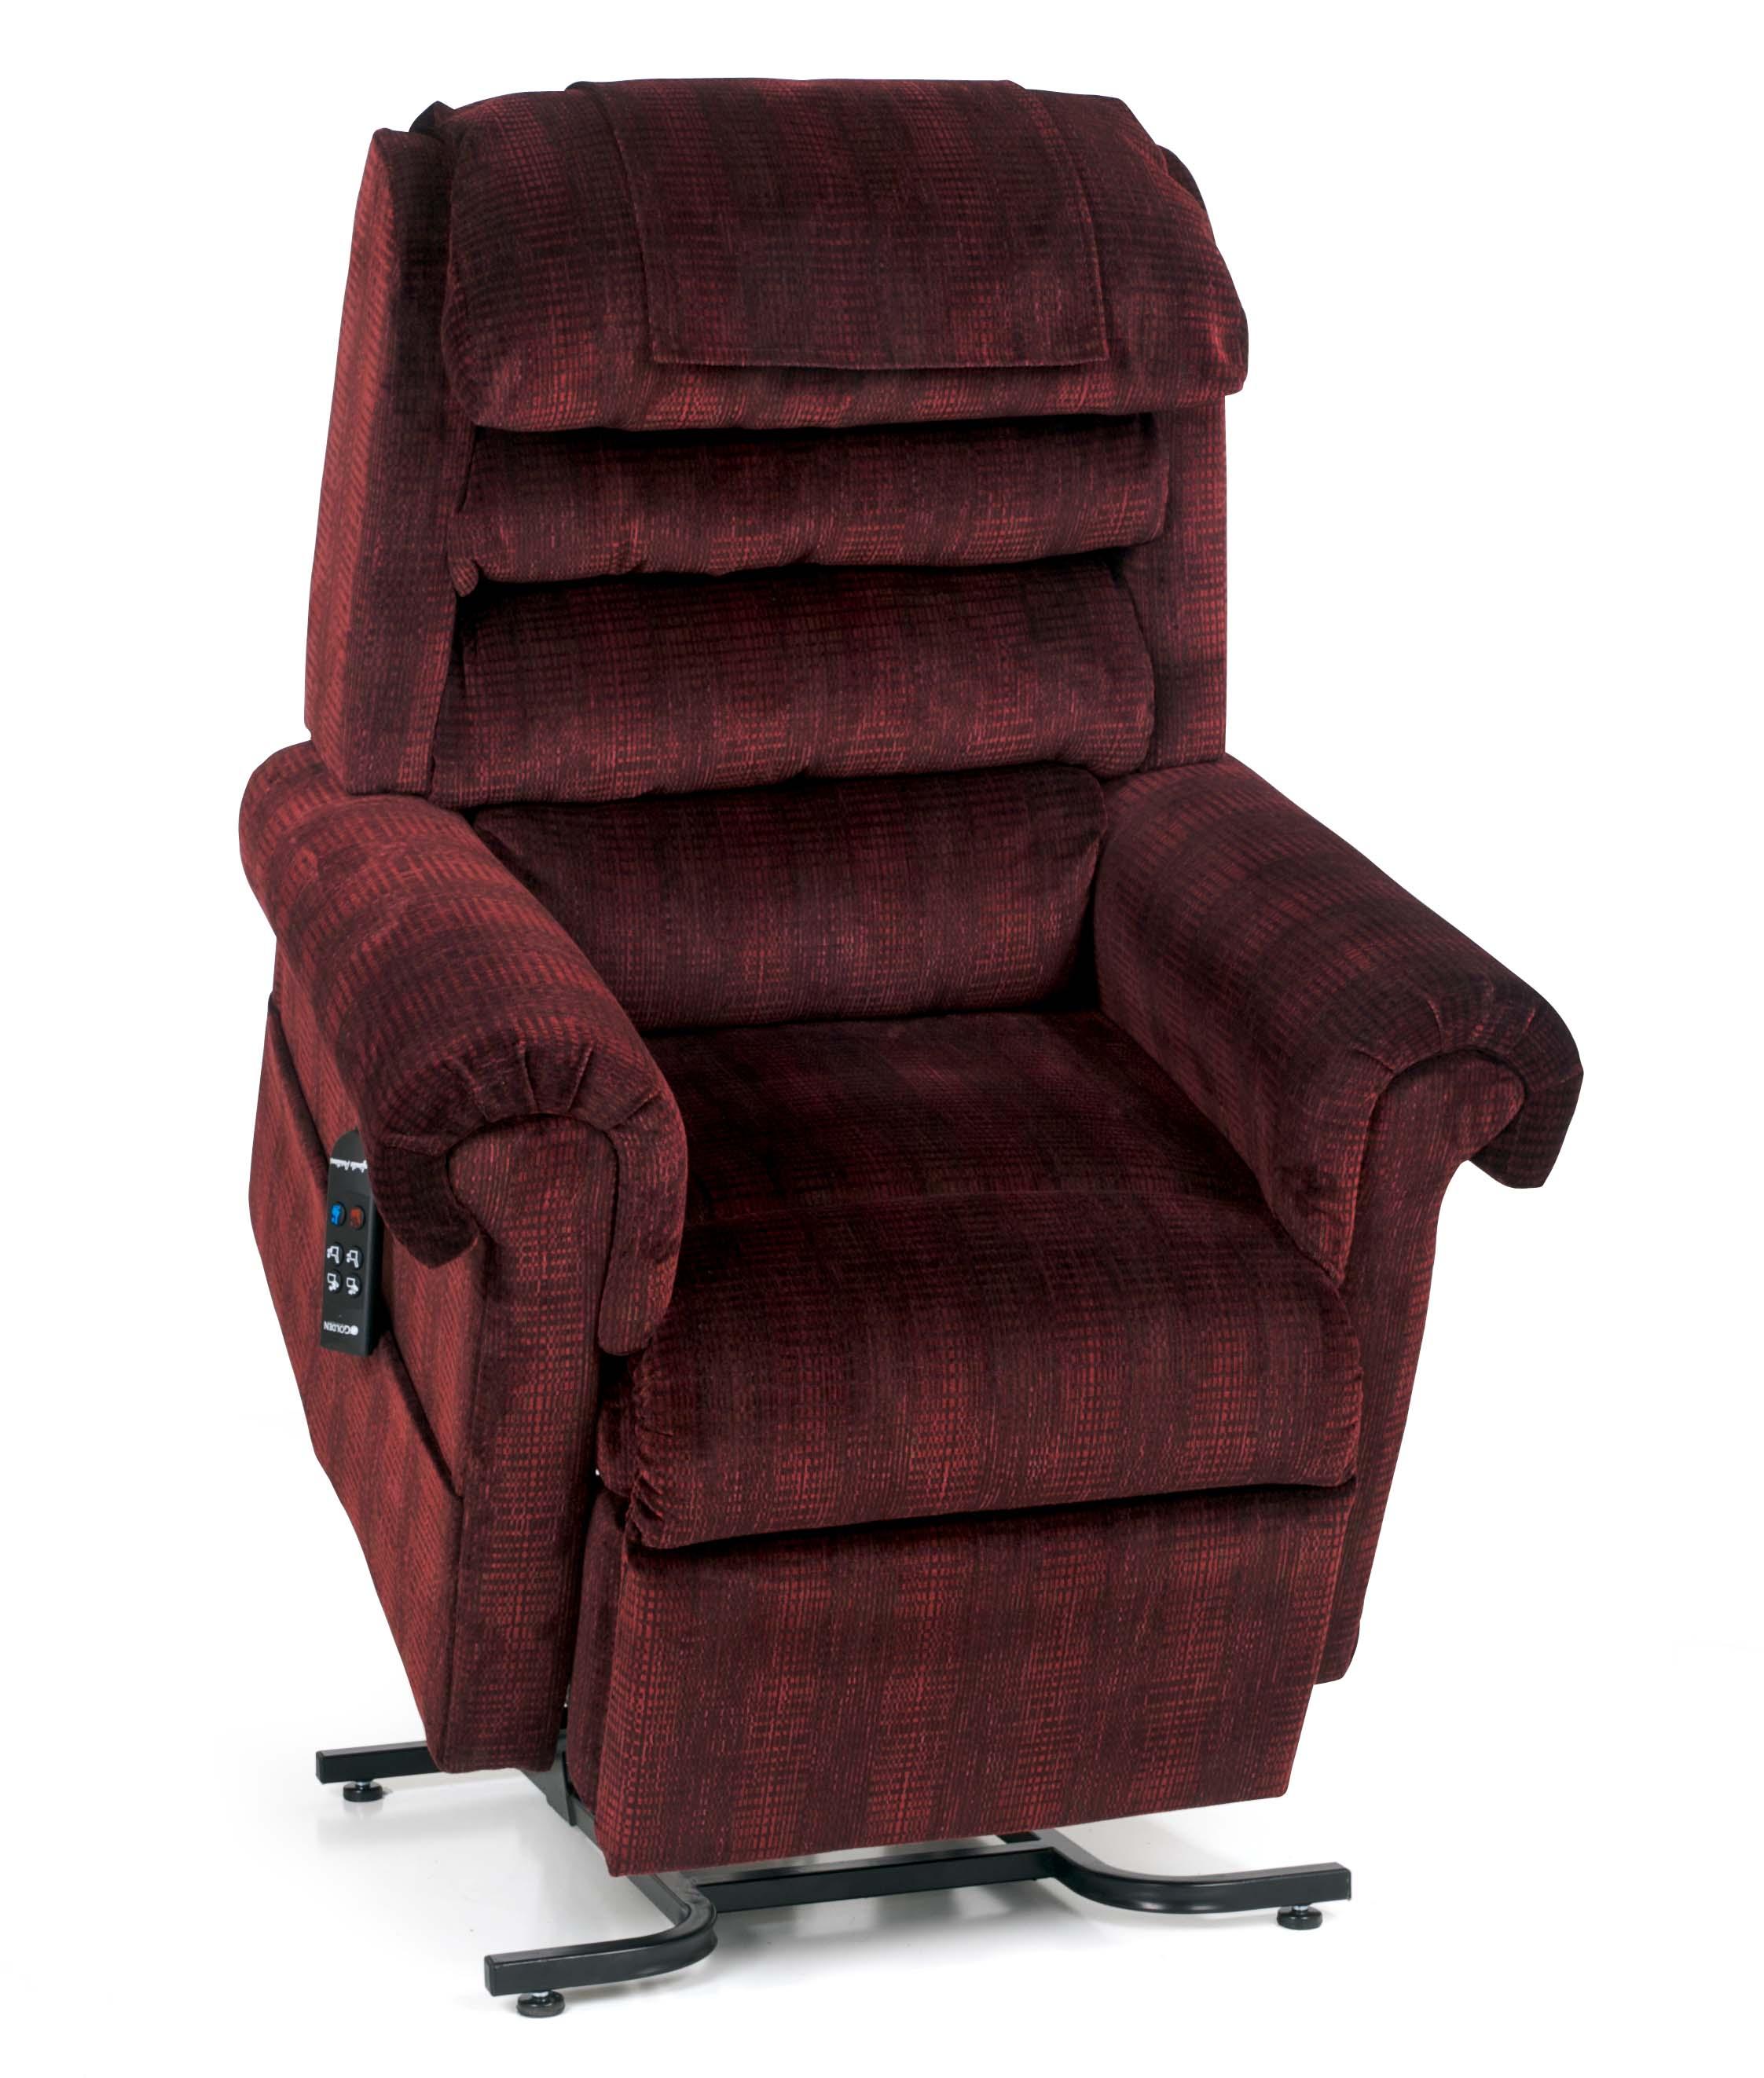 lift chairs golden technologies relaxer w/ maxicomfort (pr-756) zero-gravity lift chair UJGVDGD